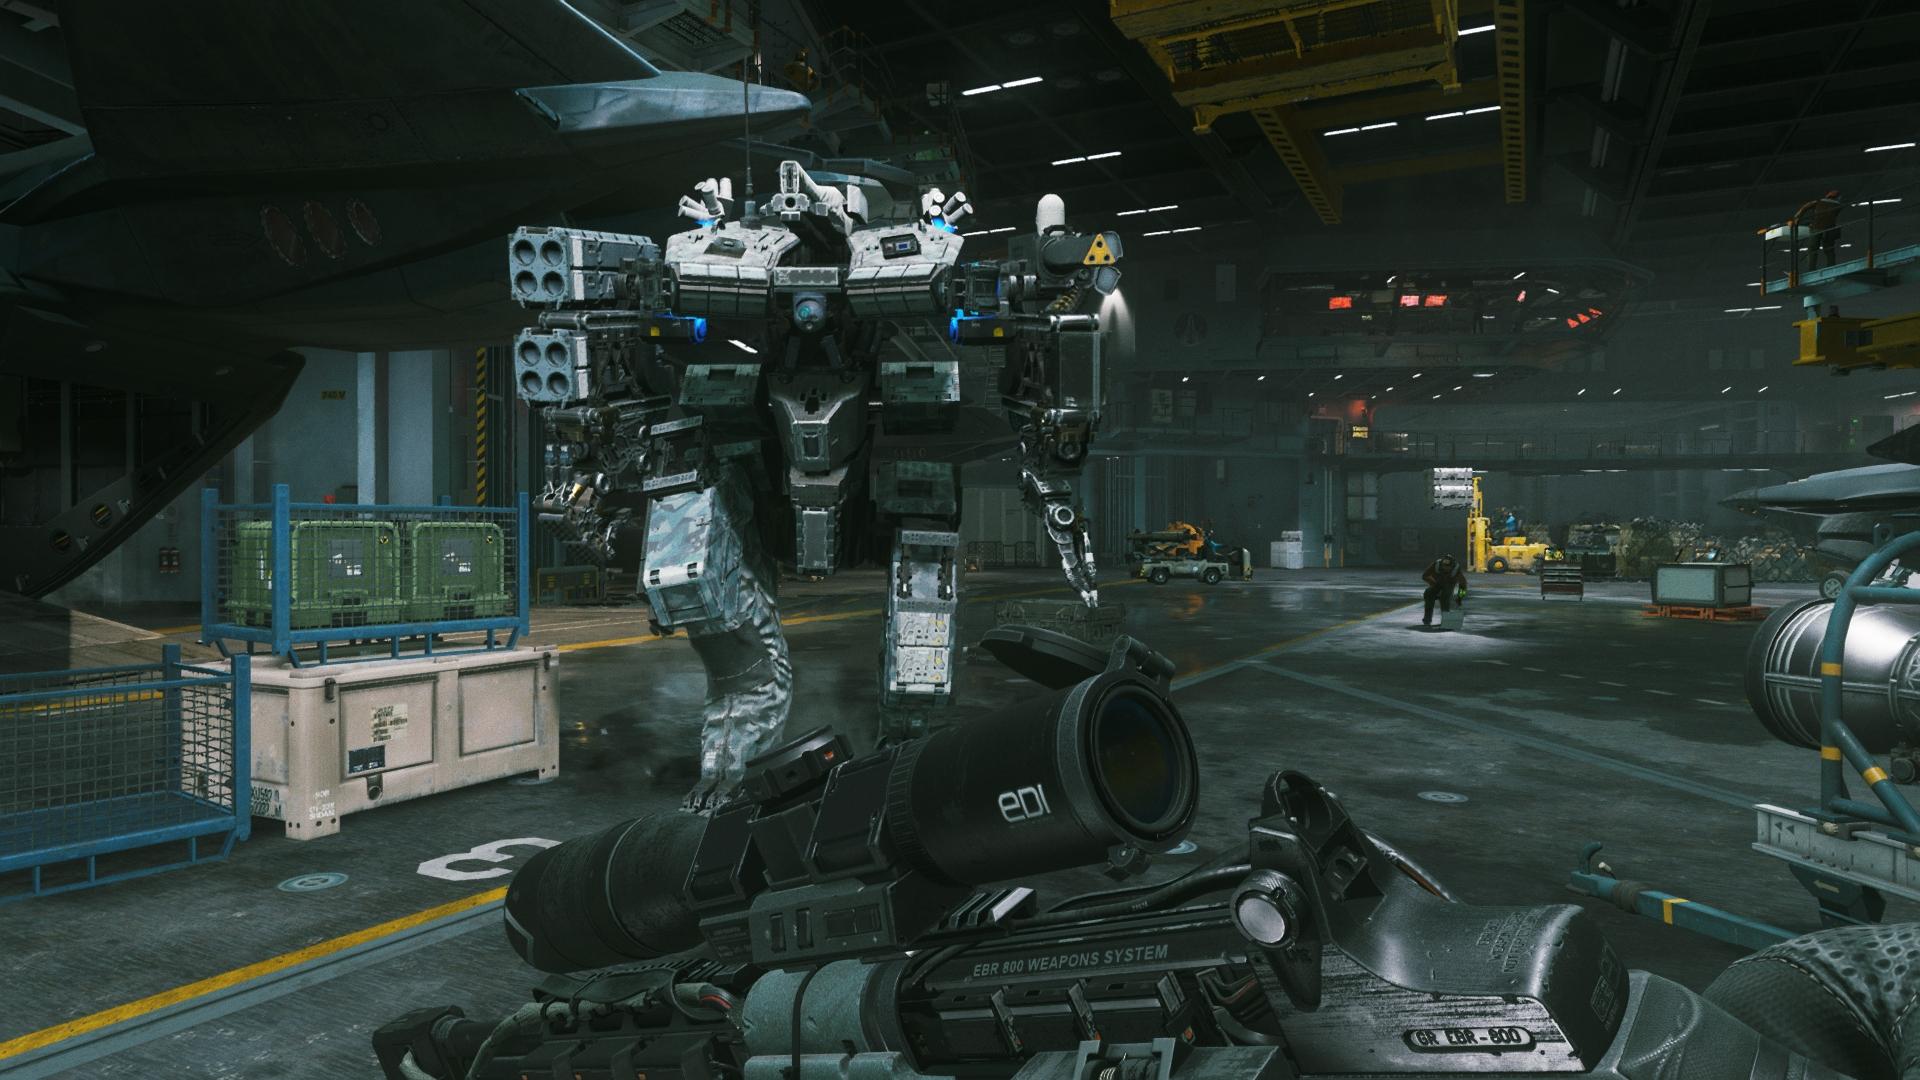 00099.Jpg - Call of Duty: Infinite Warfare